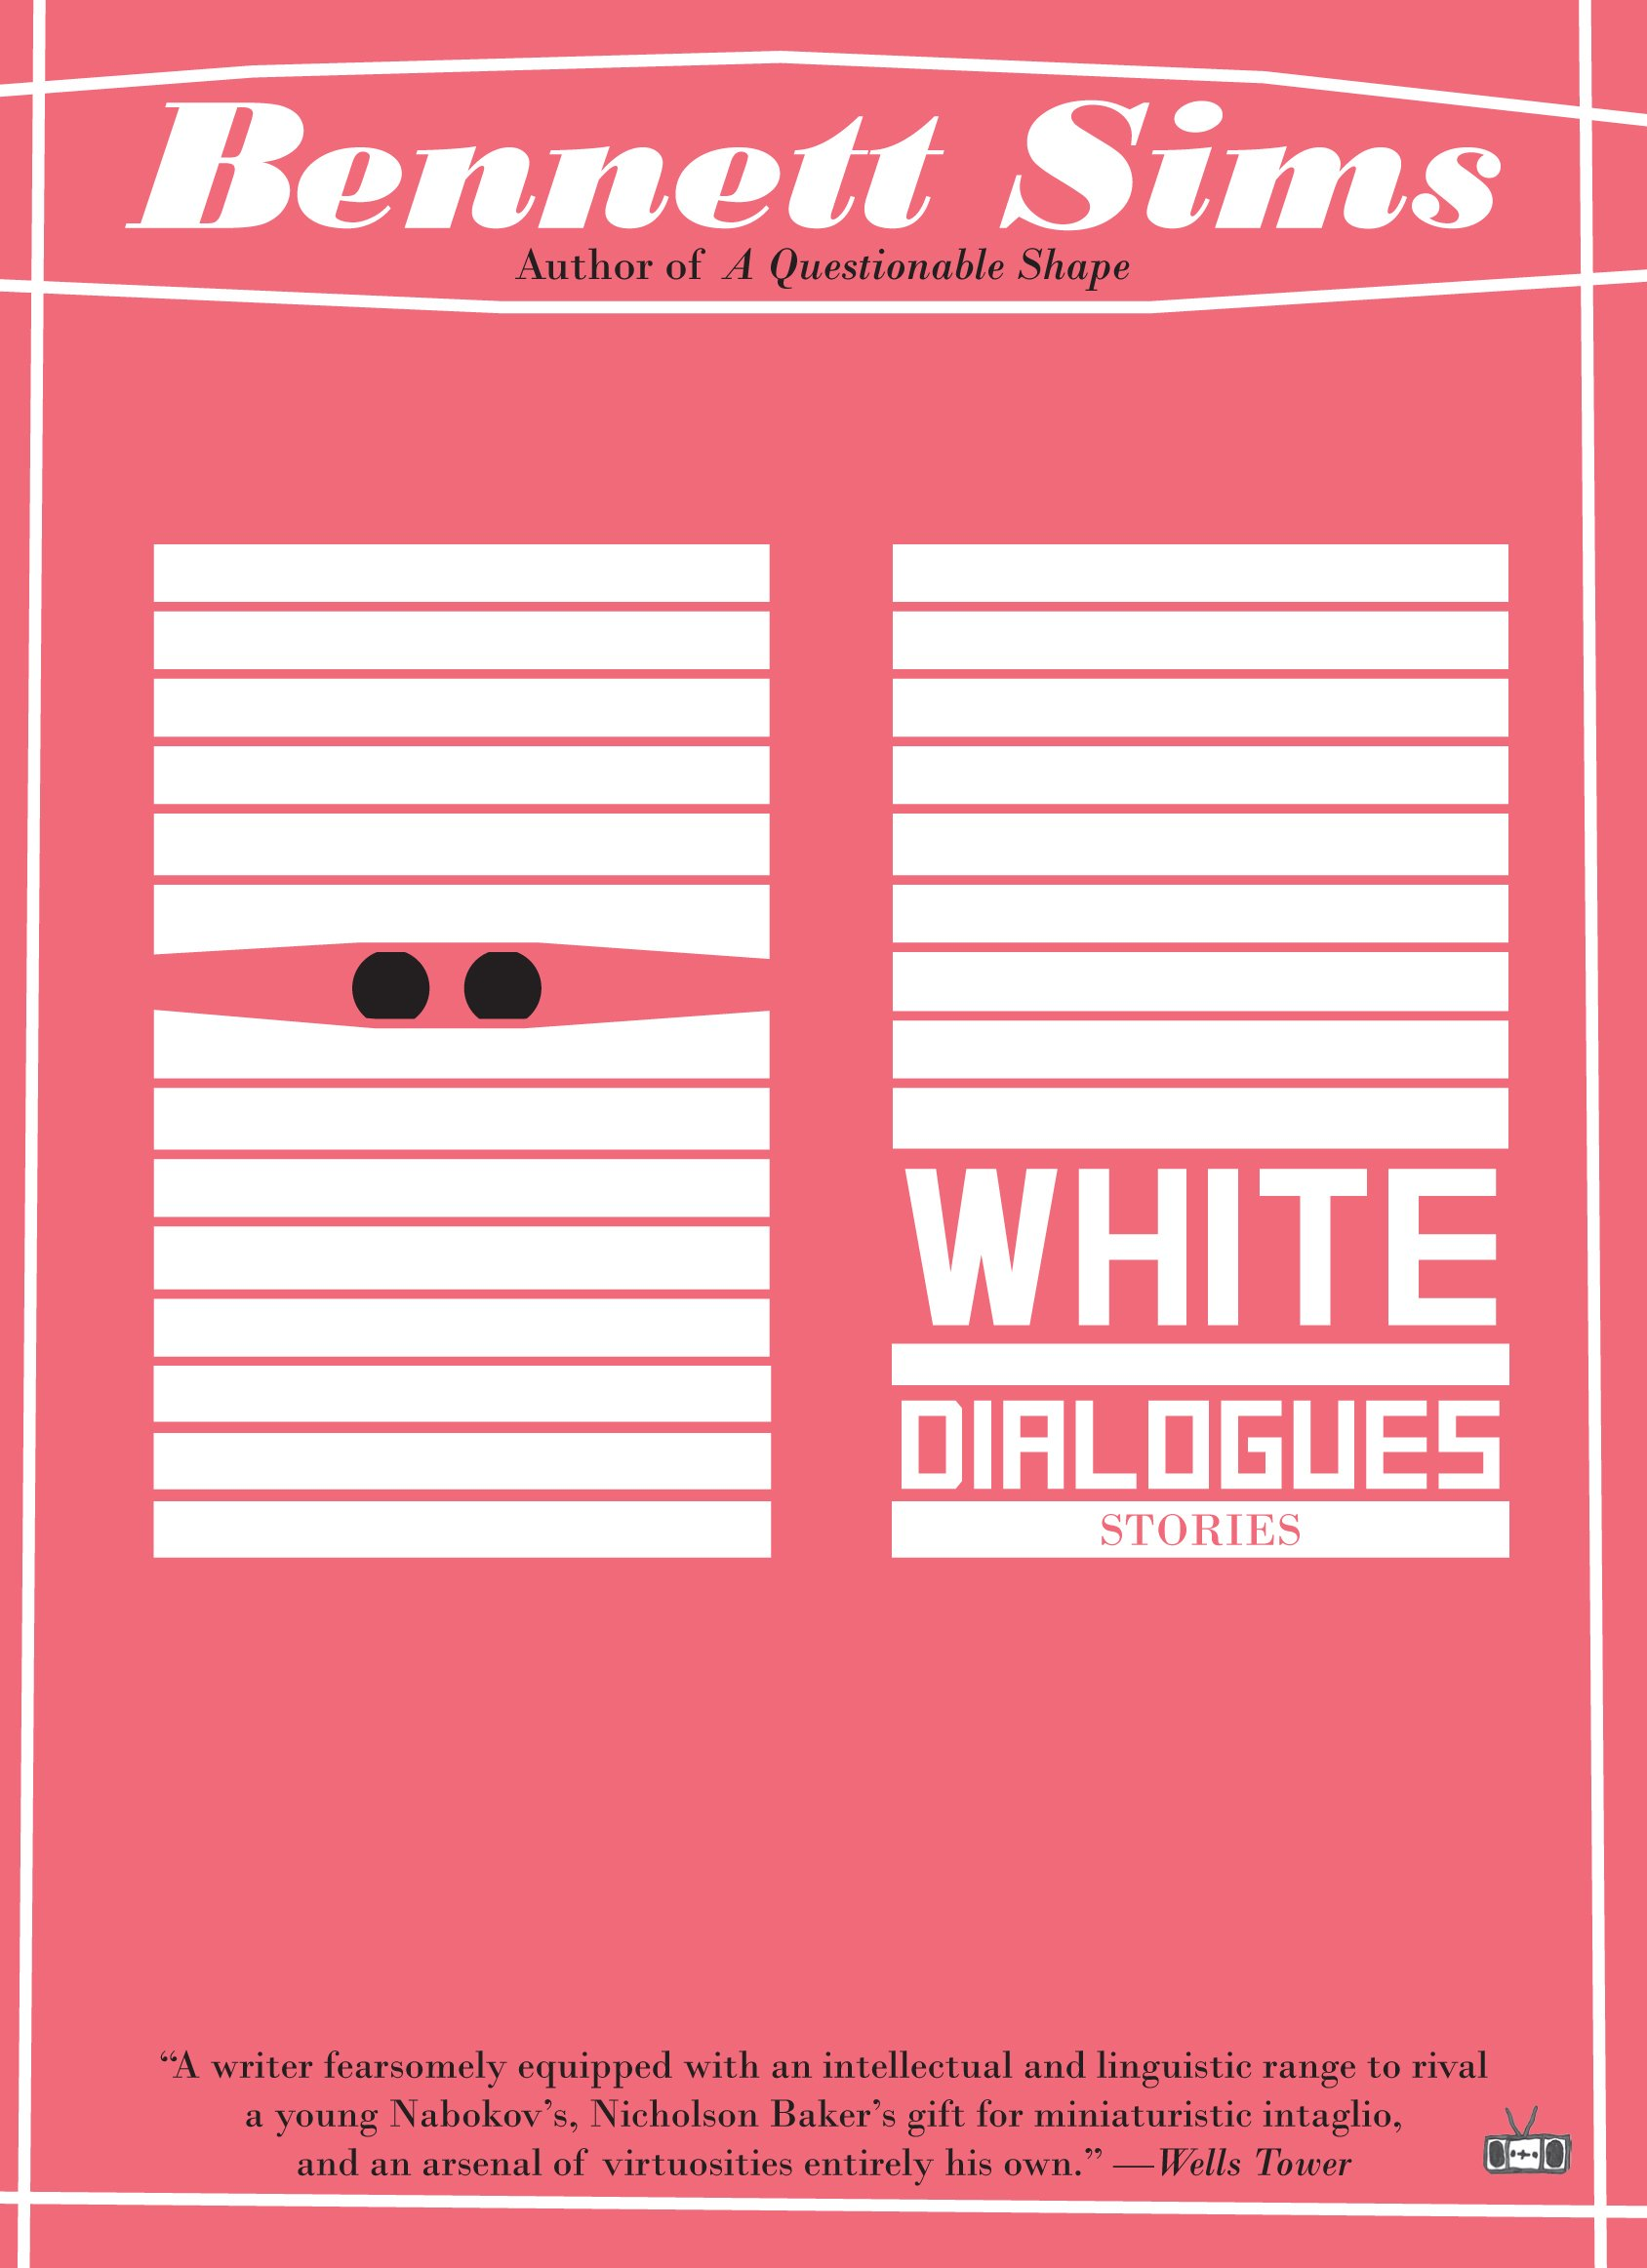 White Dialogues: Bennett Sims: 9781937512637: Amazon.com: Books